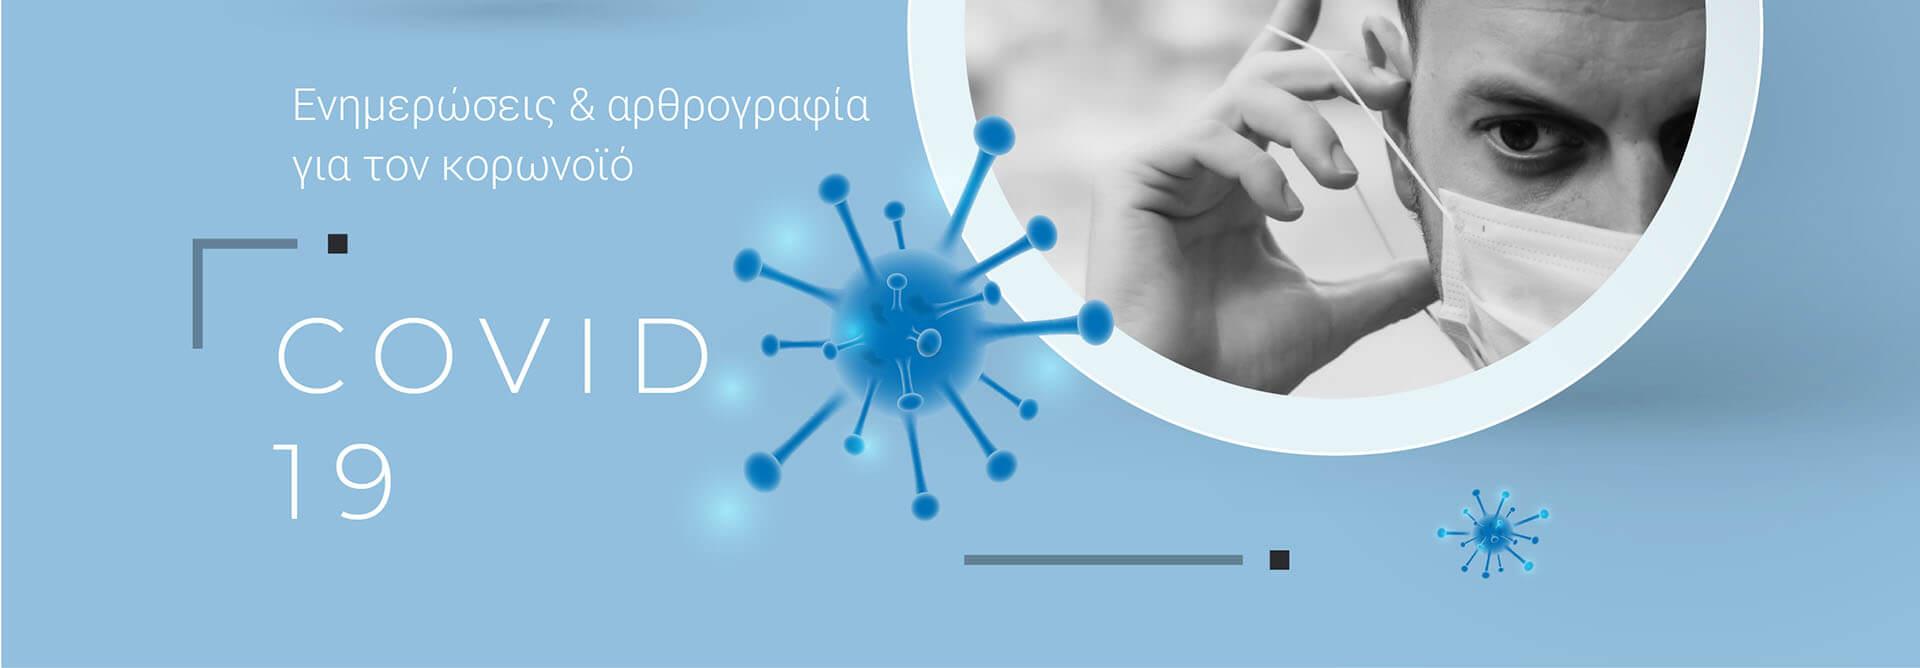 Euromedica Covid19